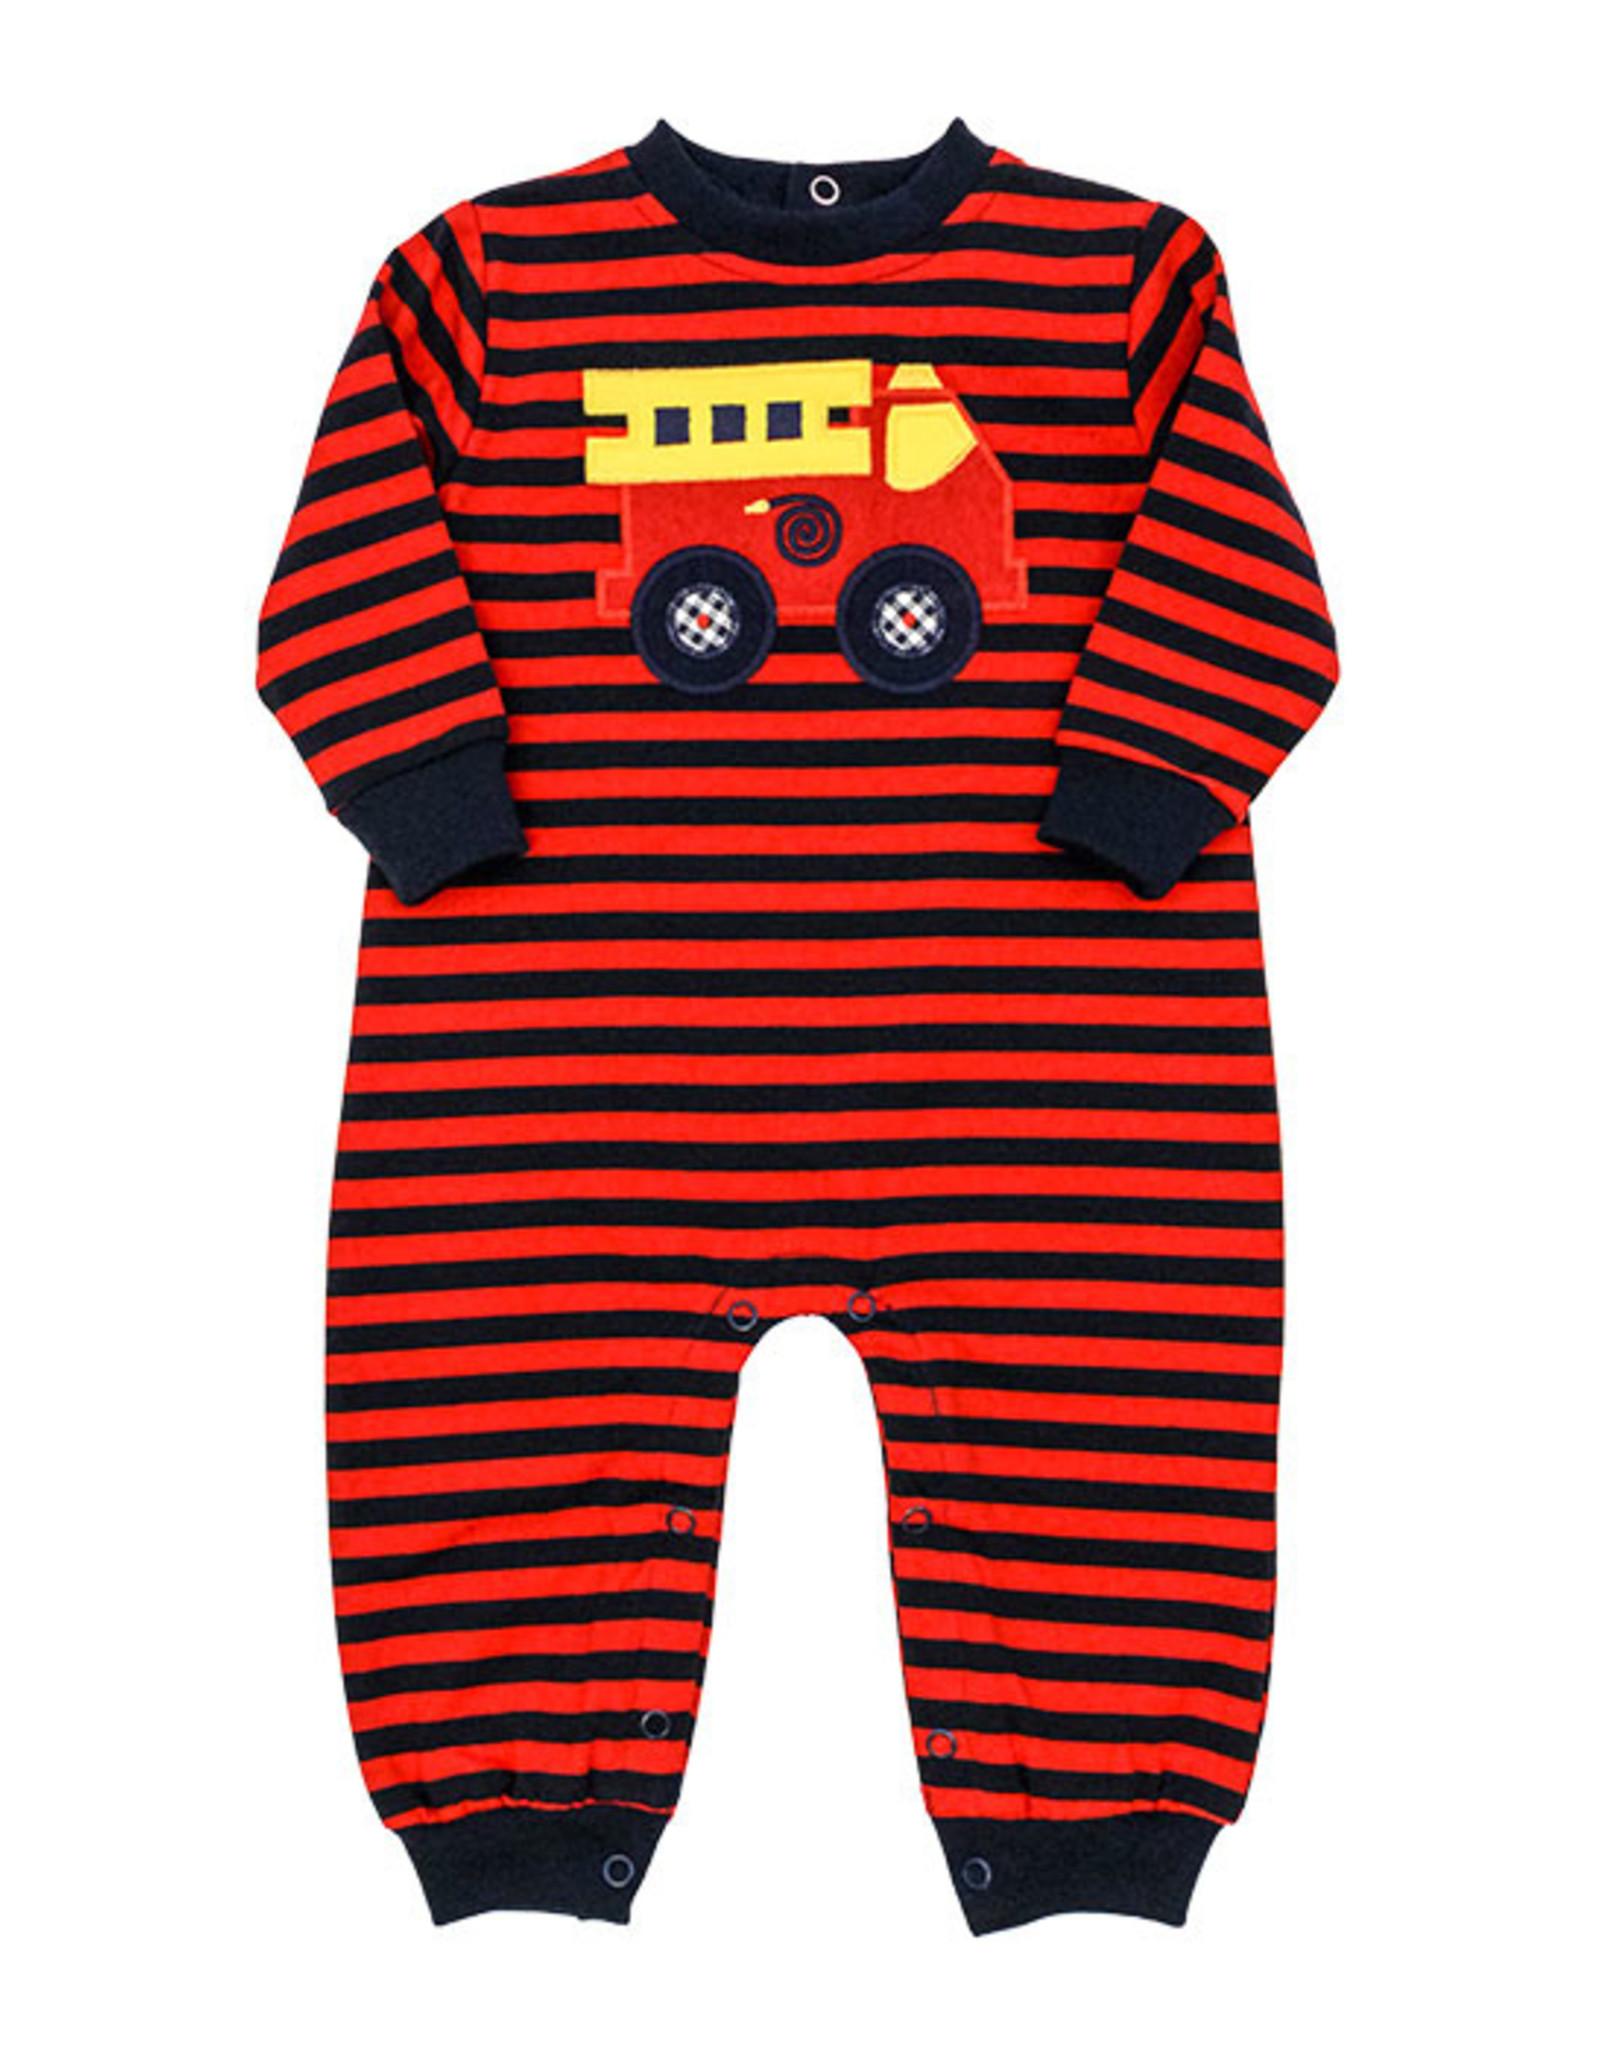 The Bailey Boys Knit Firetruck Romper